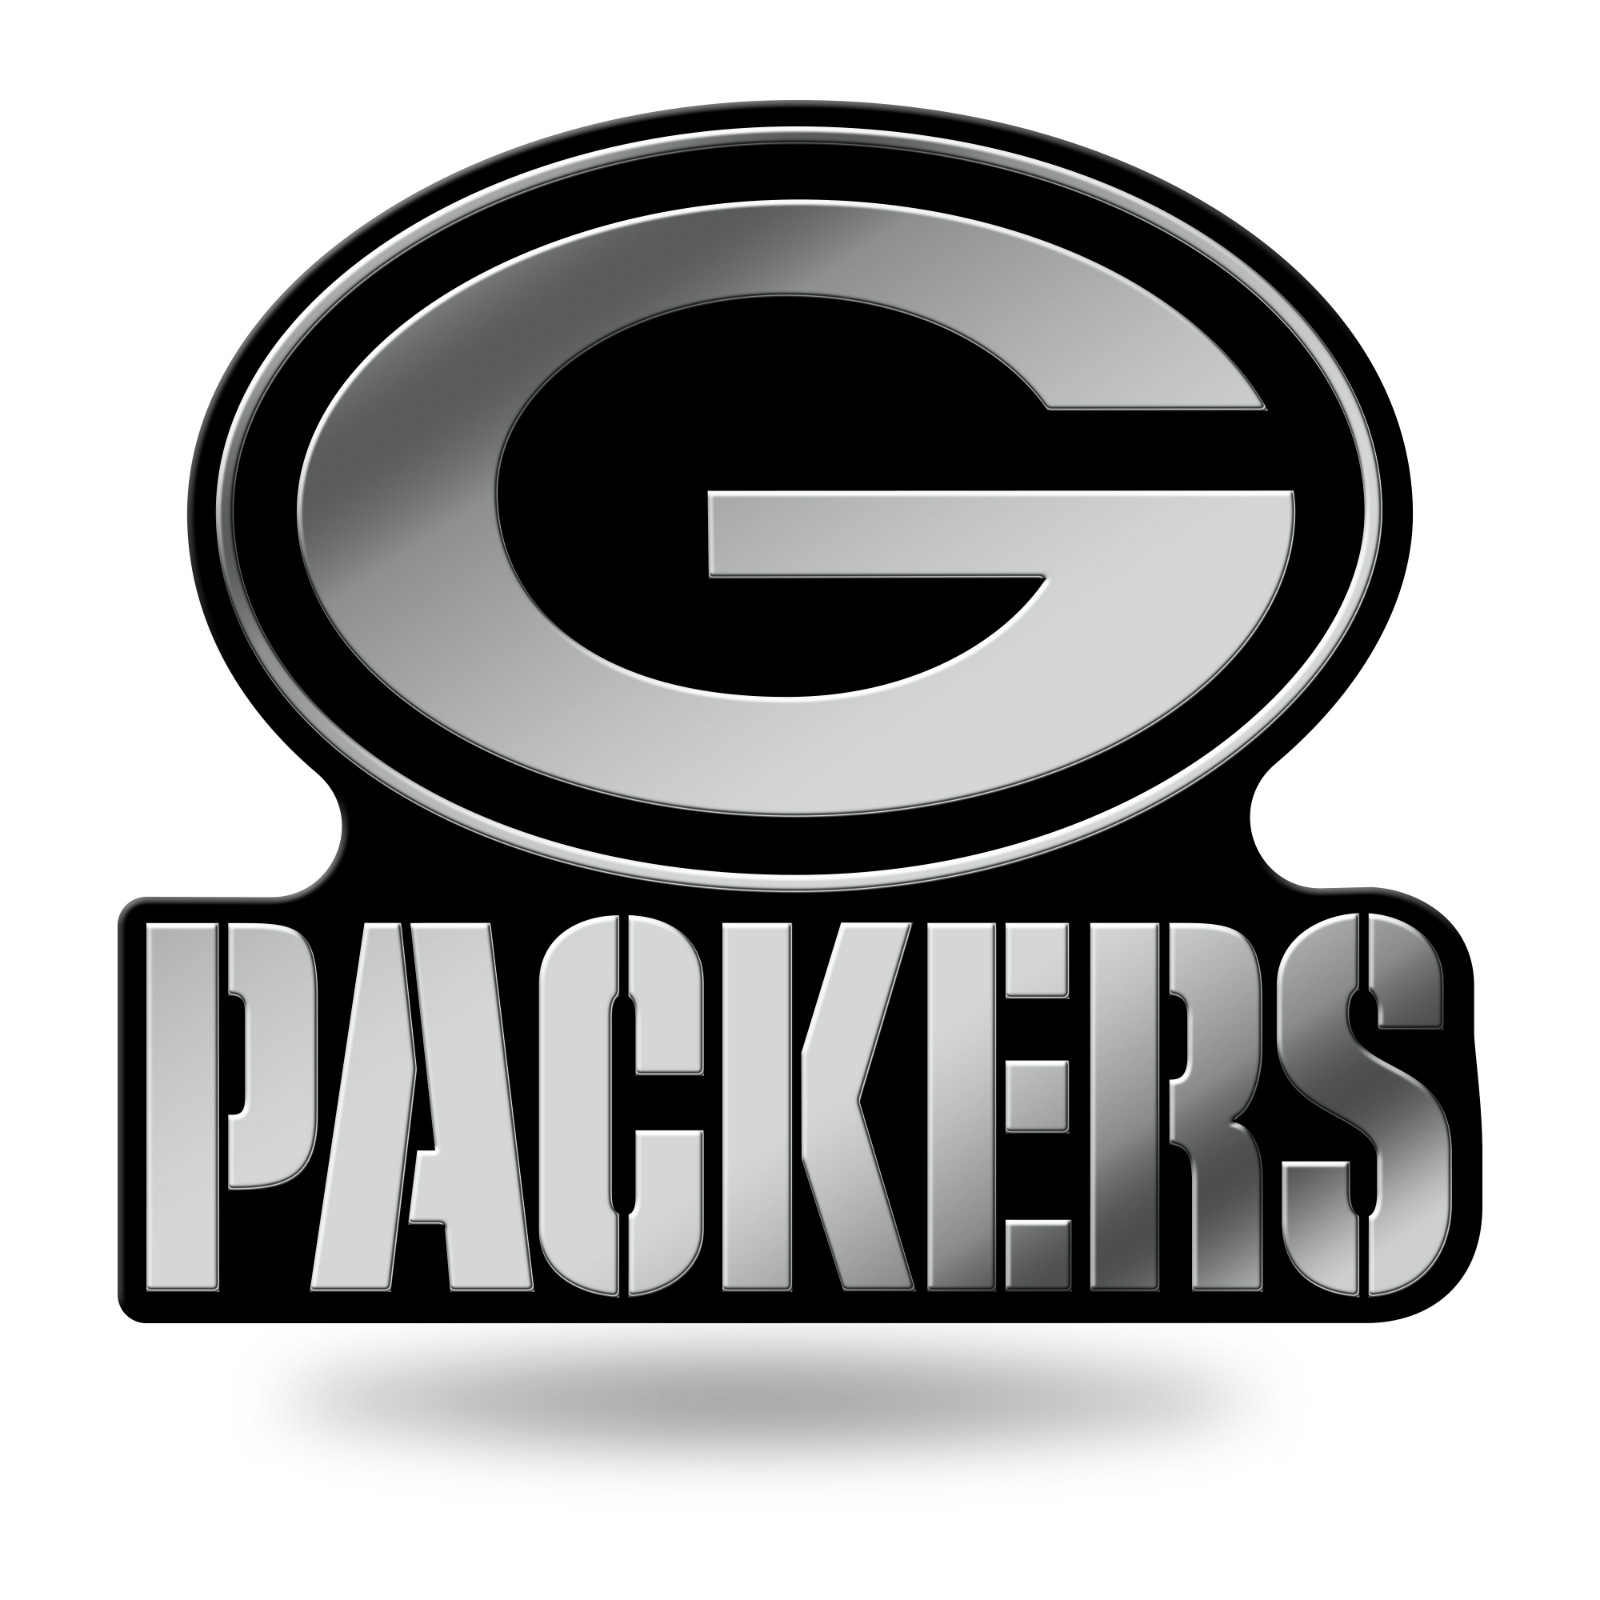 Green Bay Packers Logo 3d Chrome Auto Emblem New Truck Or Car 94746935191 Ebay